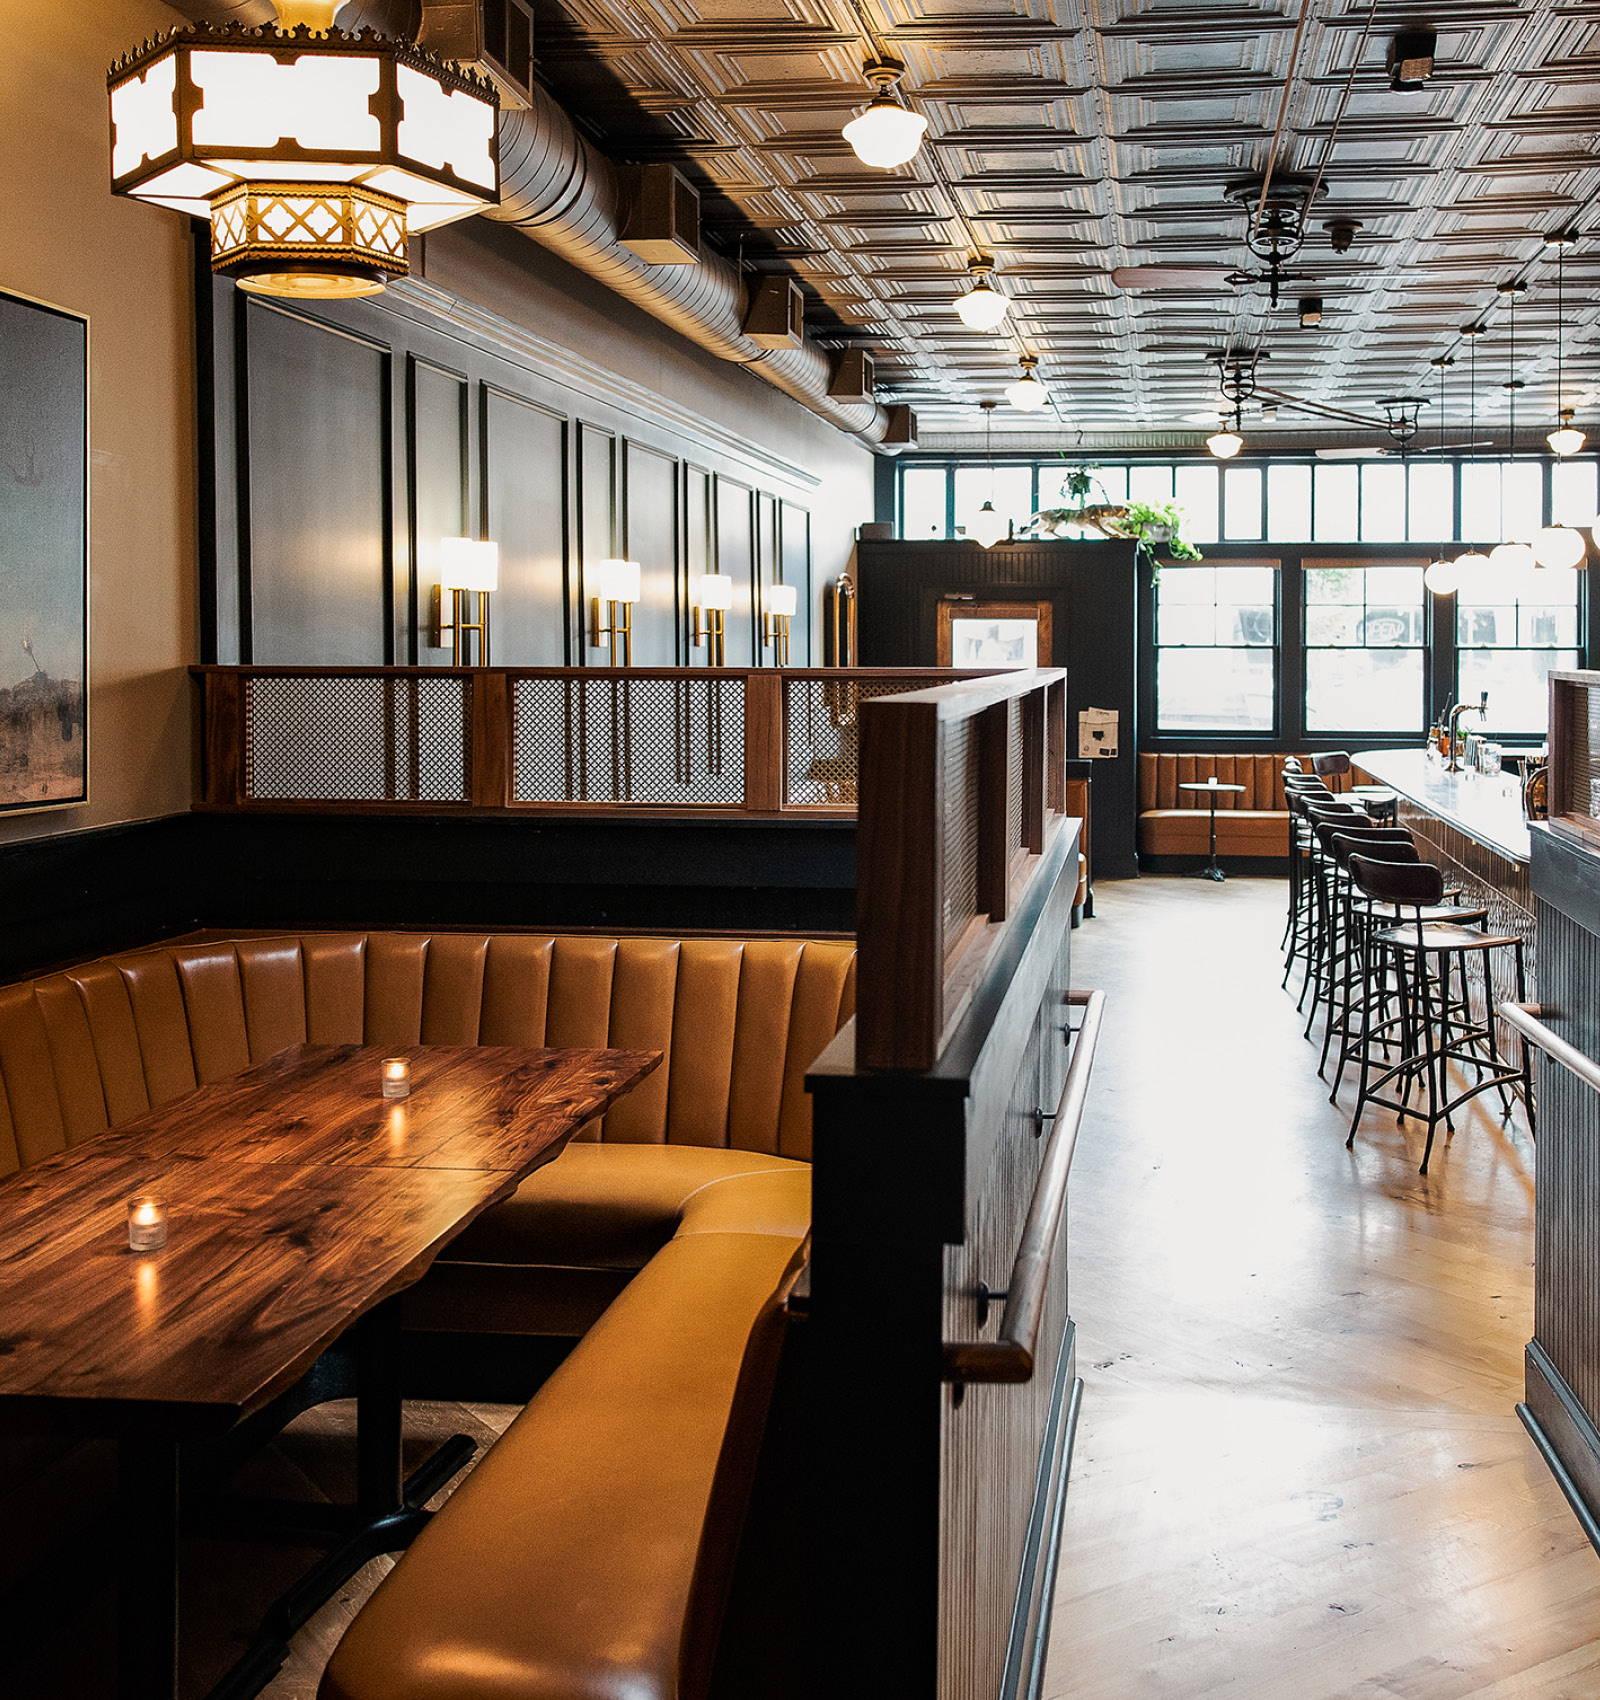 Inside The Jasper, a bar in Richmond Virginia